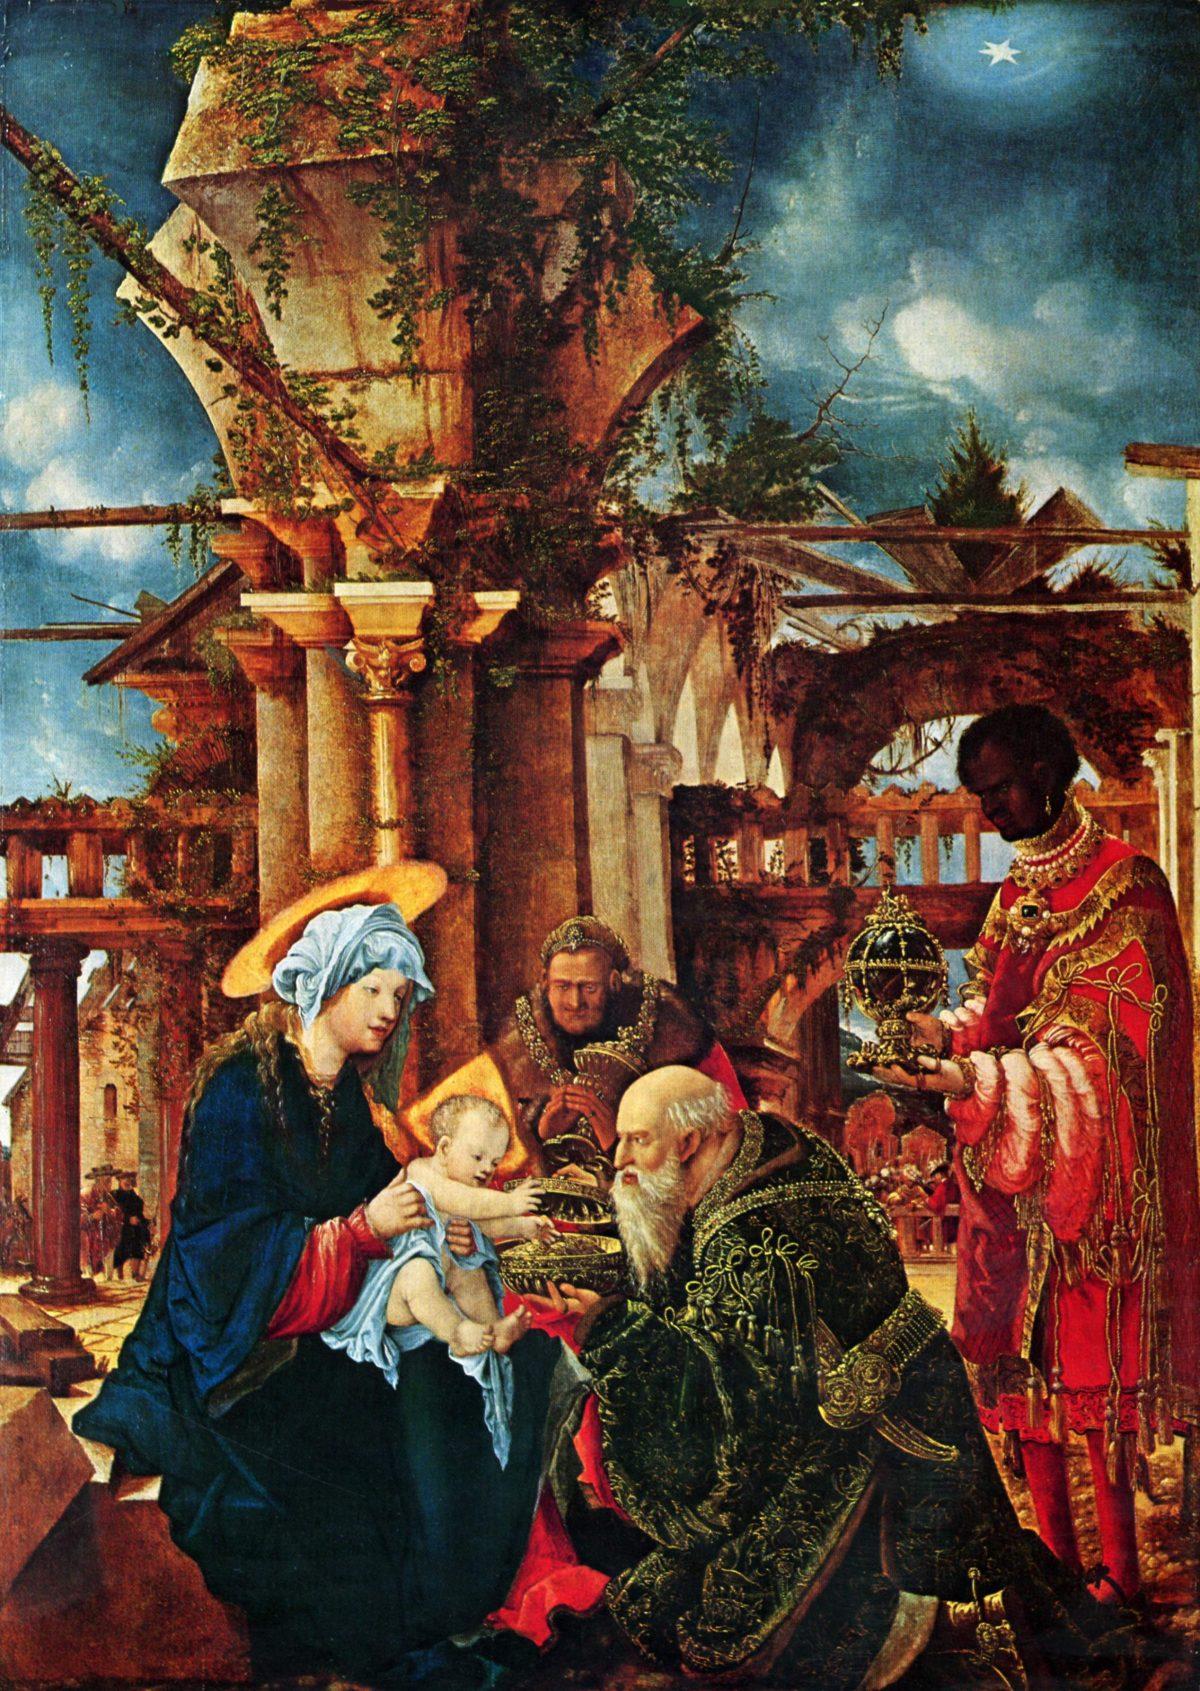 Adoration of the Magi, circa 1530, Albrecht Altdorfer